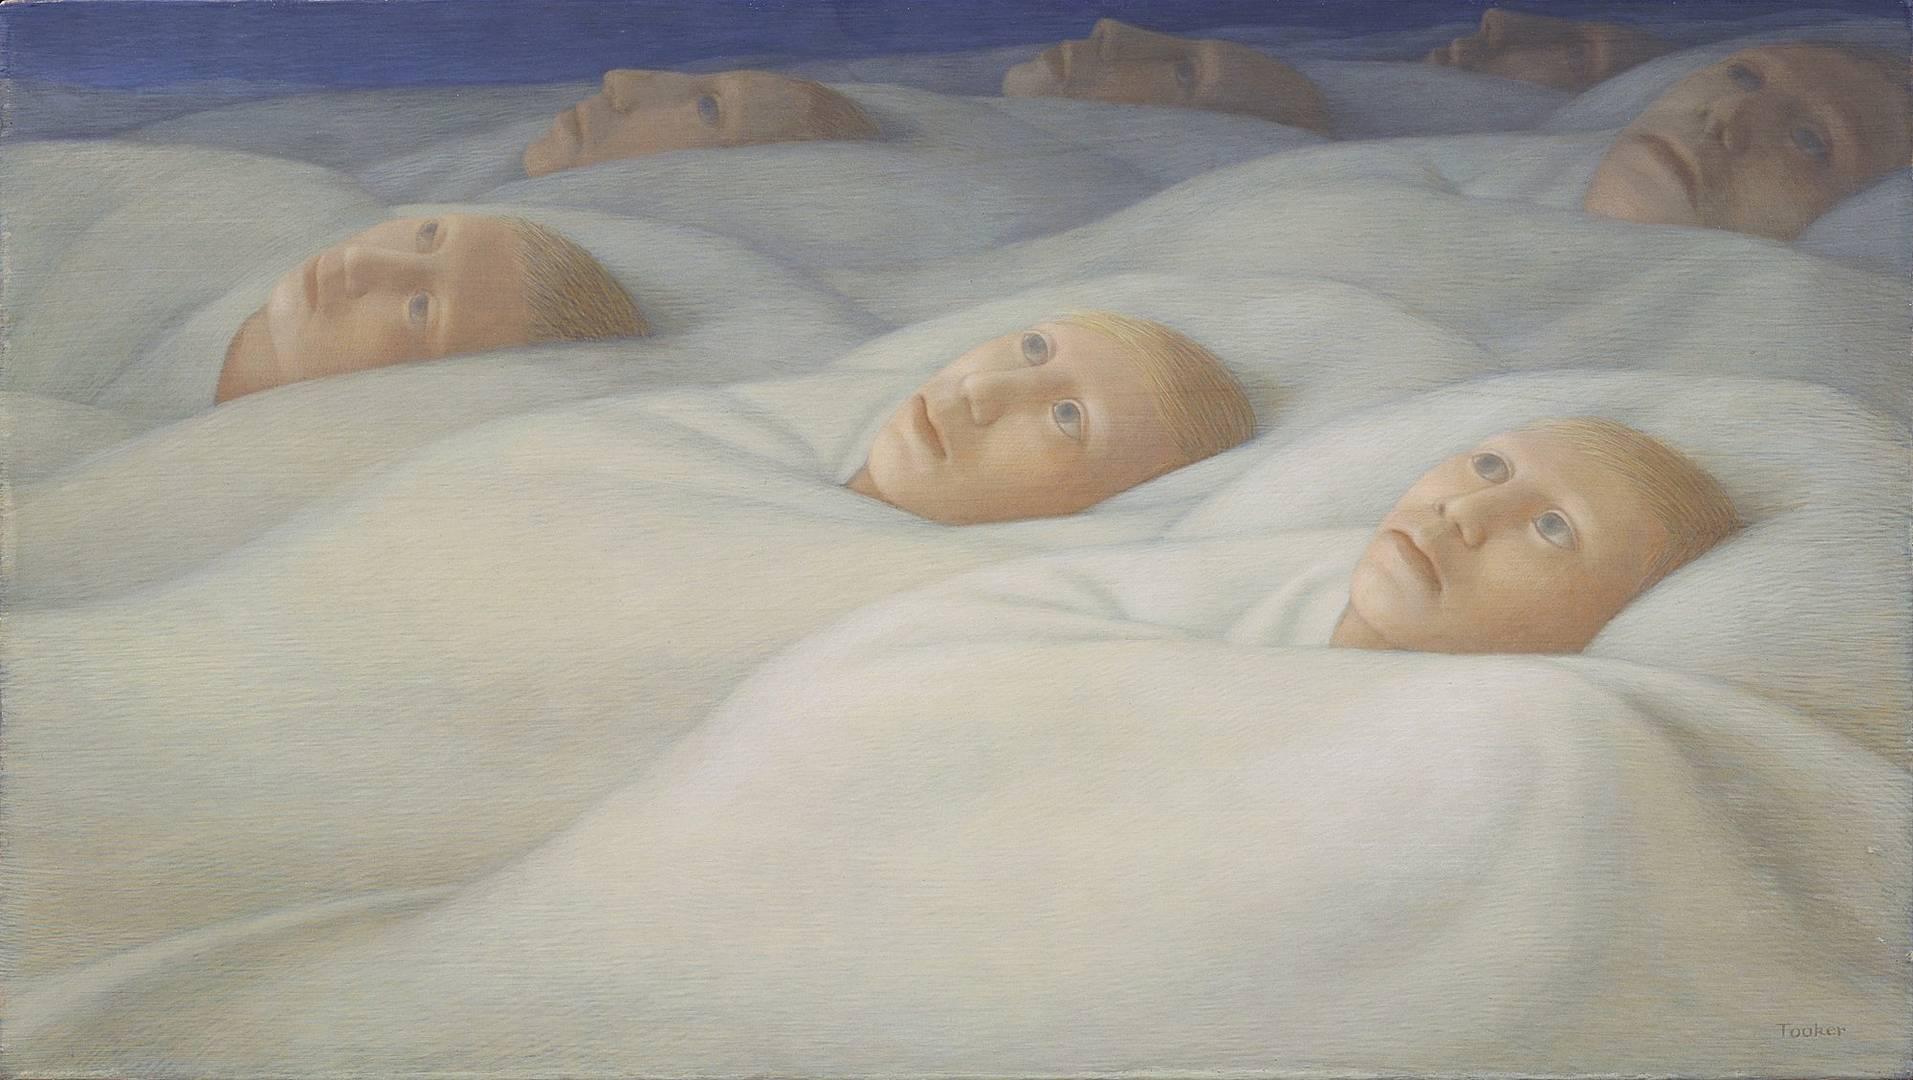 Джордж Тукер. Спящие II. 1959